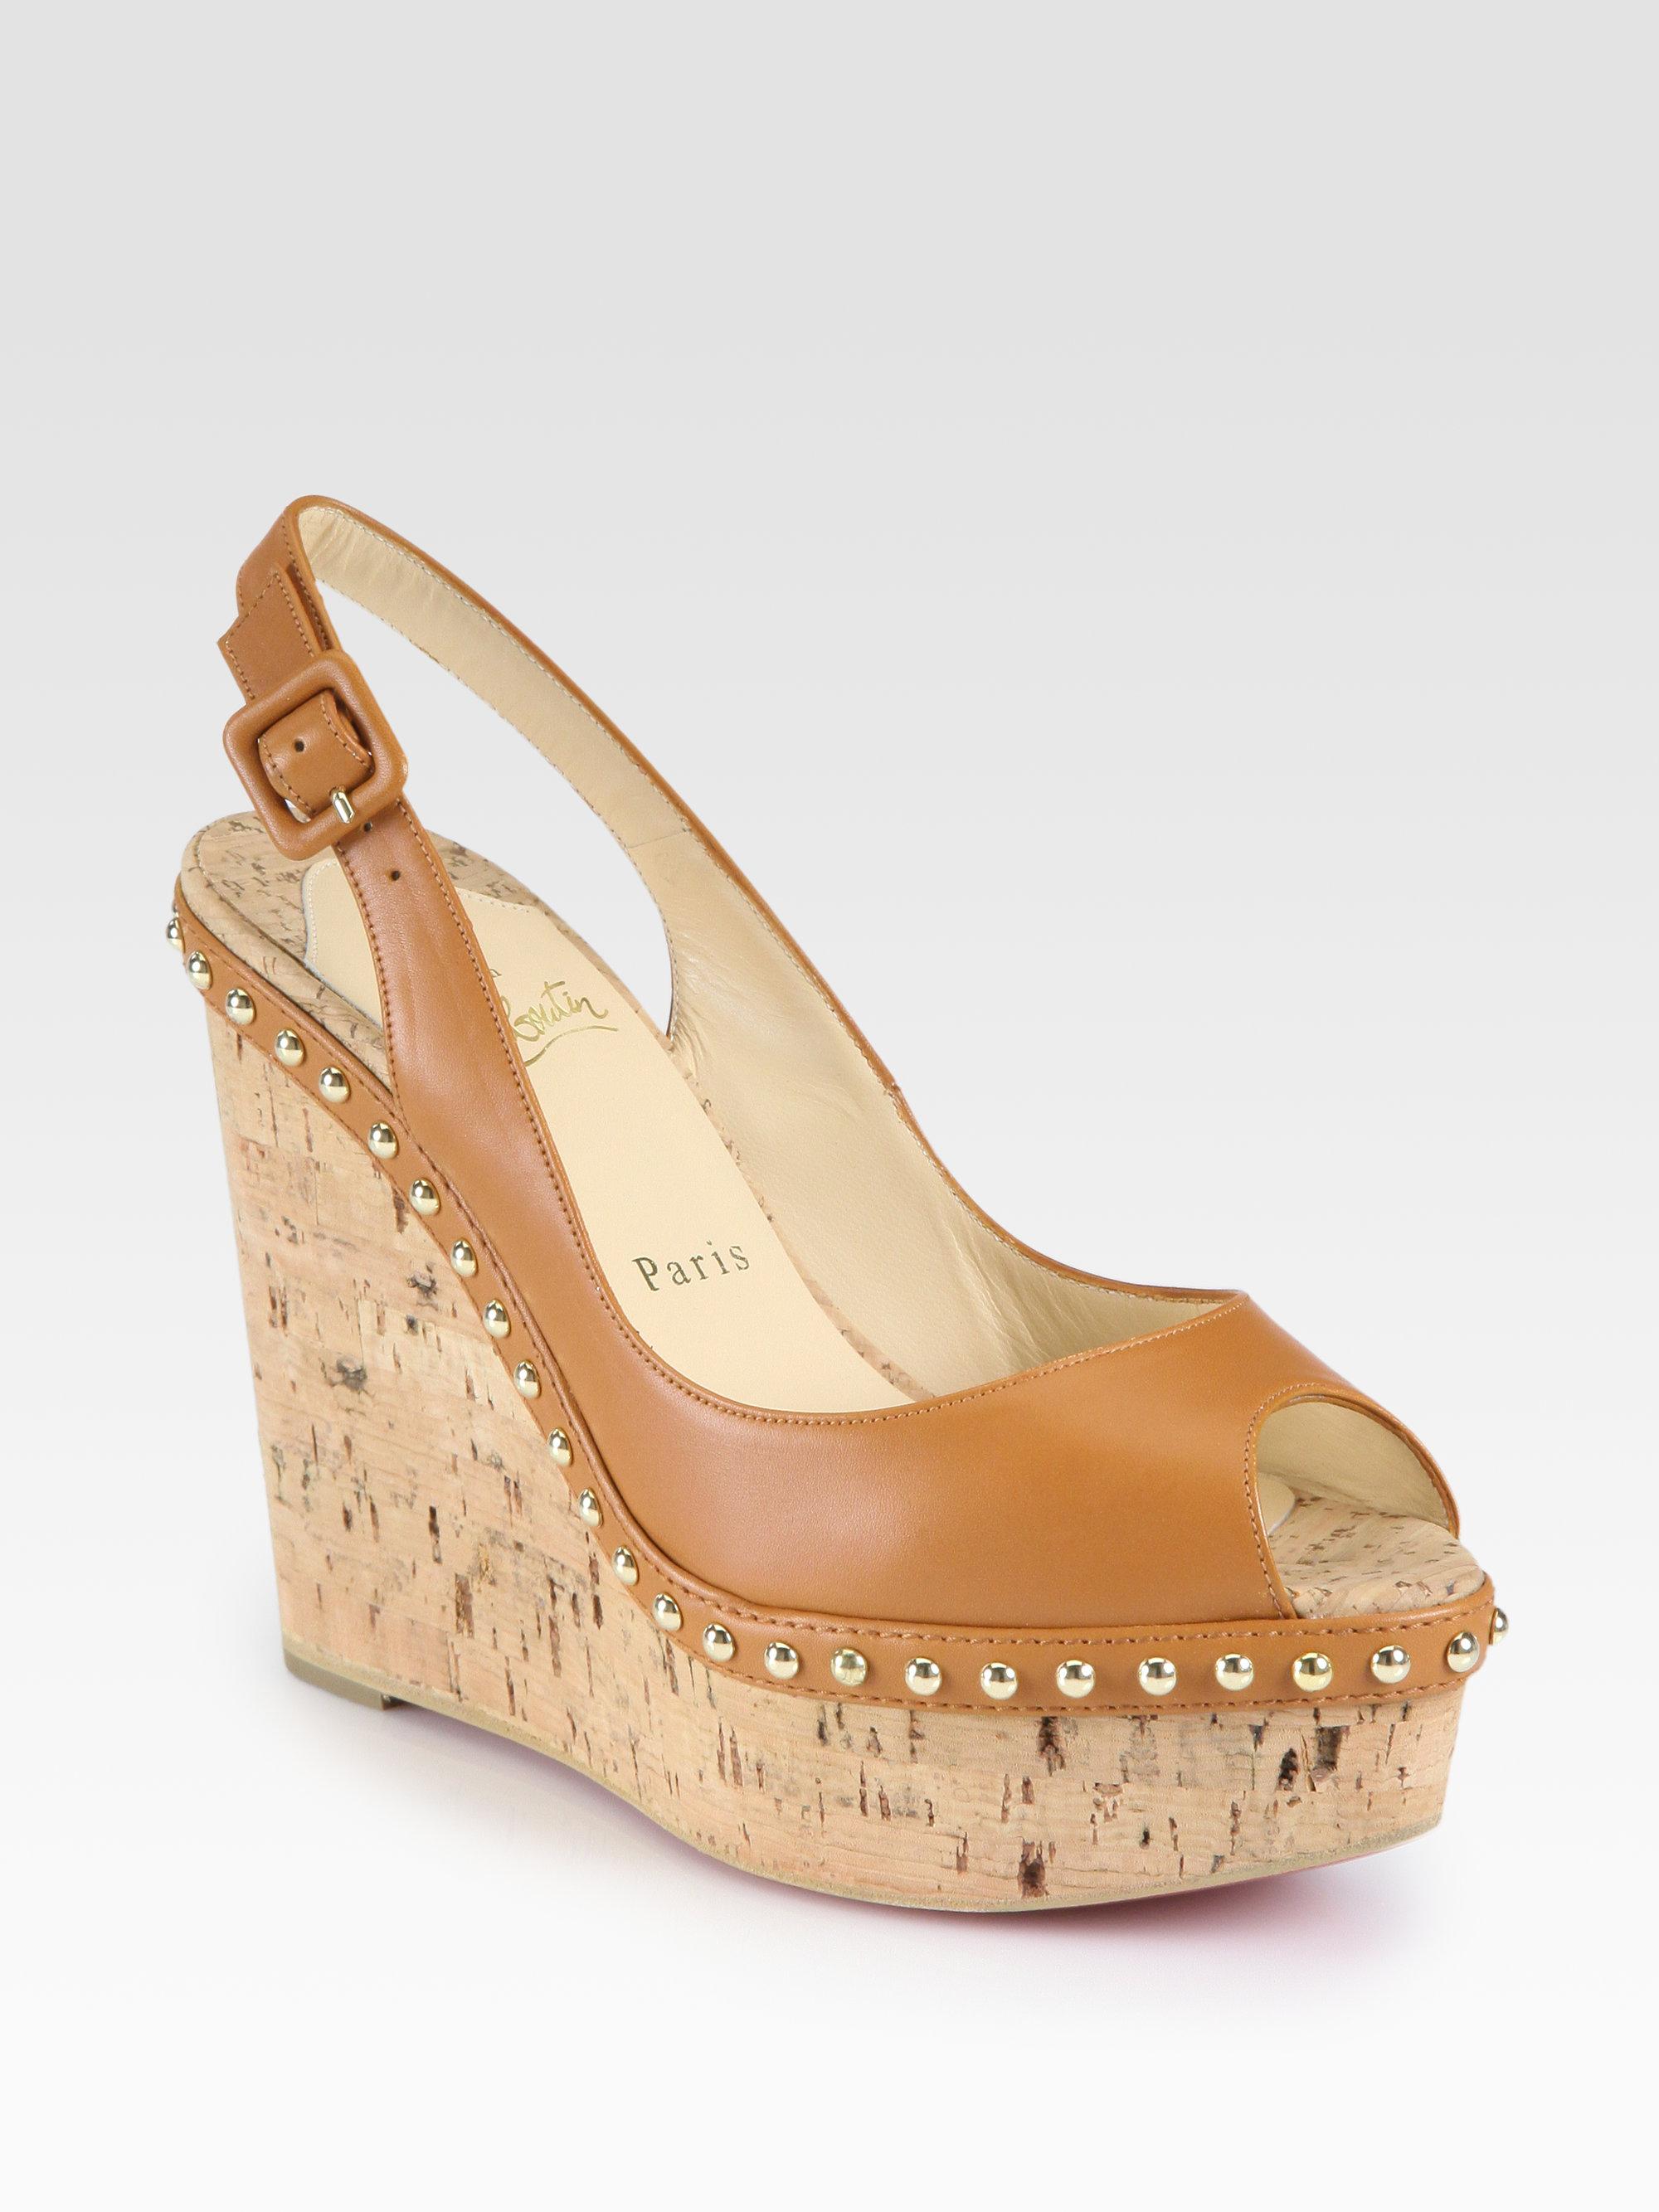 christian louboutin peep-toe wedges Tan patent leather cork design ...